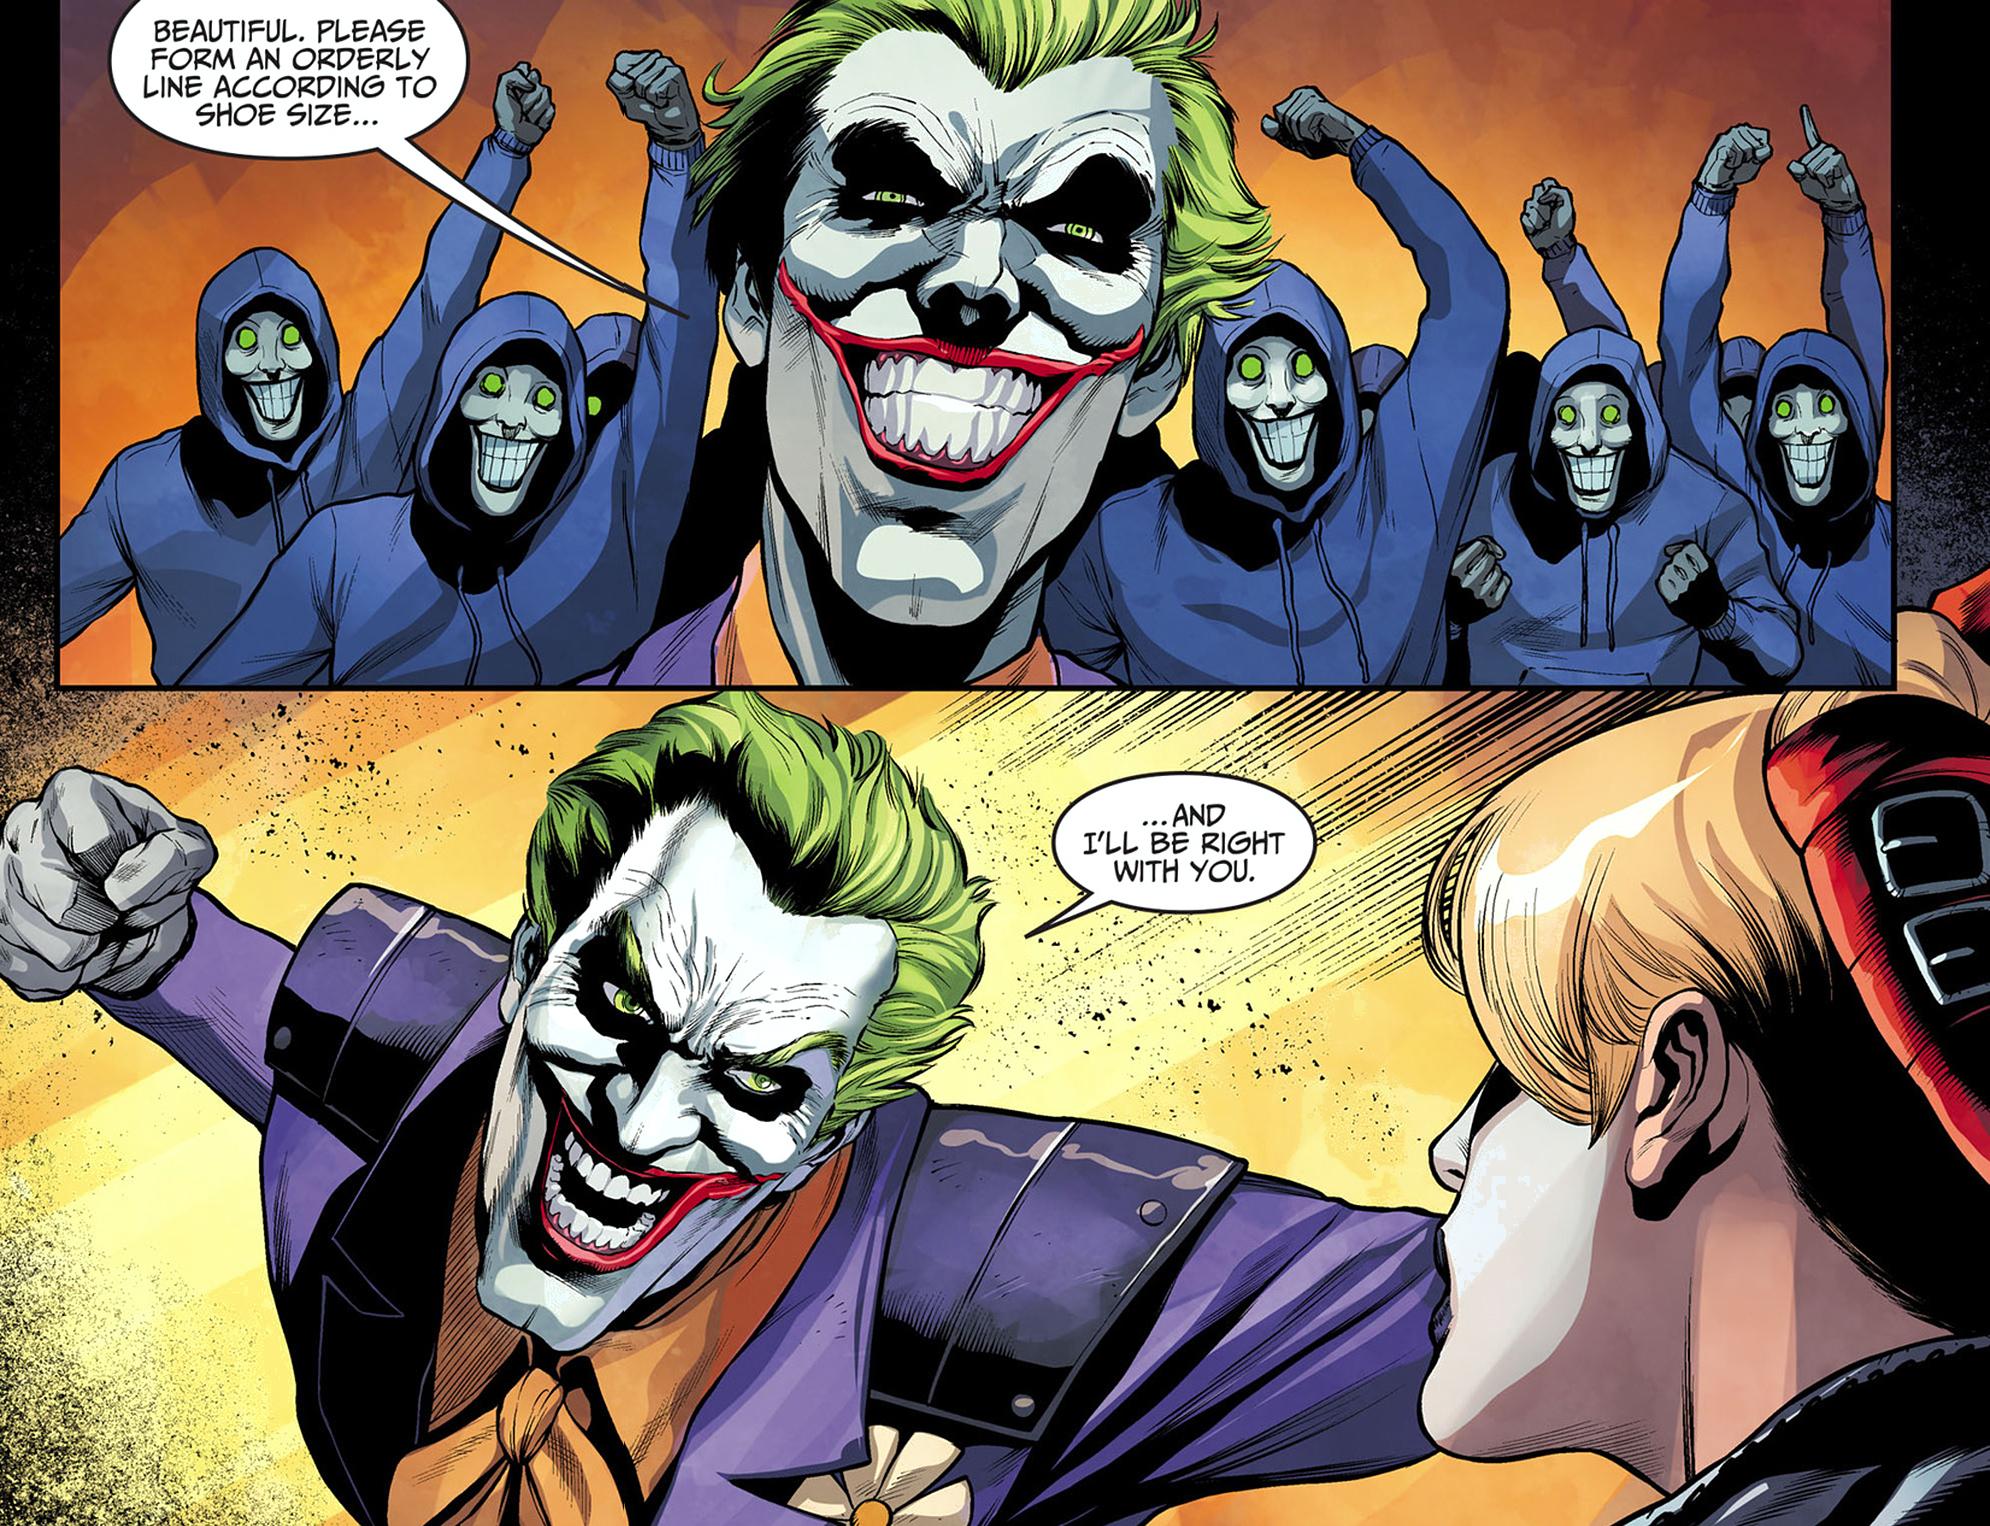 8753373fa70b8b ... the-joker-vs-harley-quinn-injustice-gods-among- ...